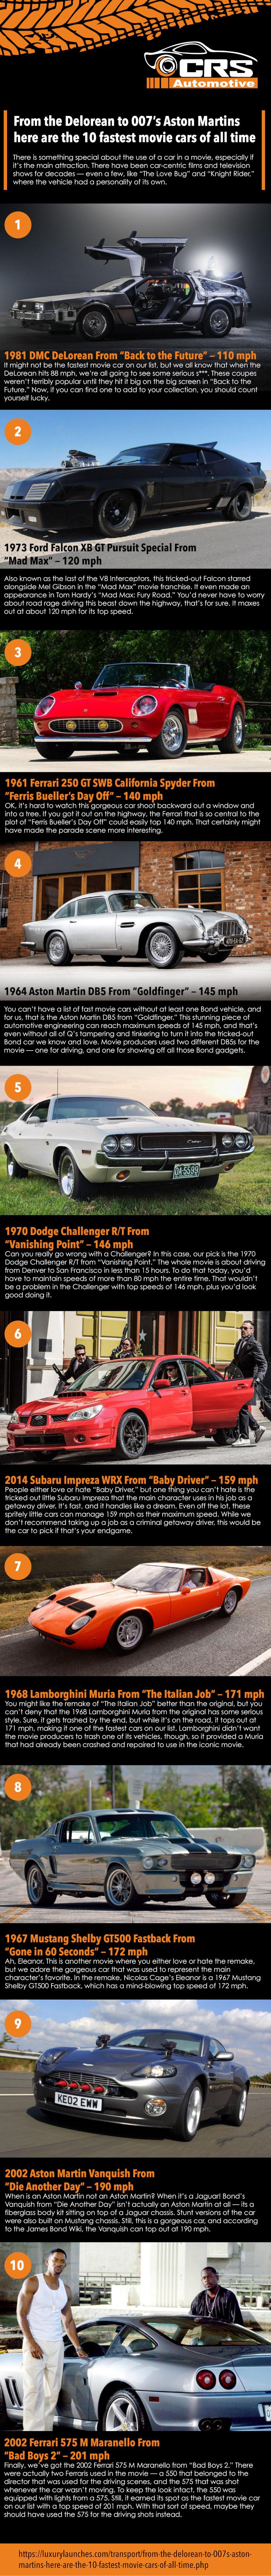 10 Fastest Movie Cars - CRS Automotive Hamilton